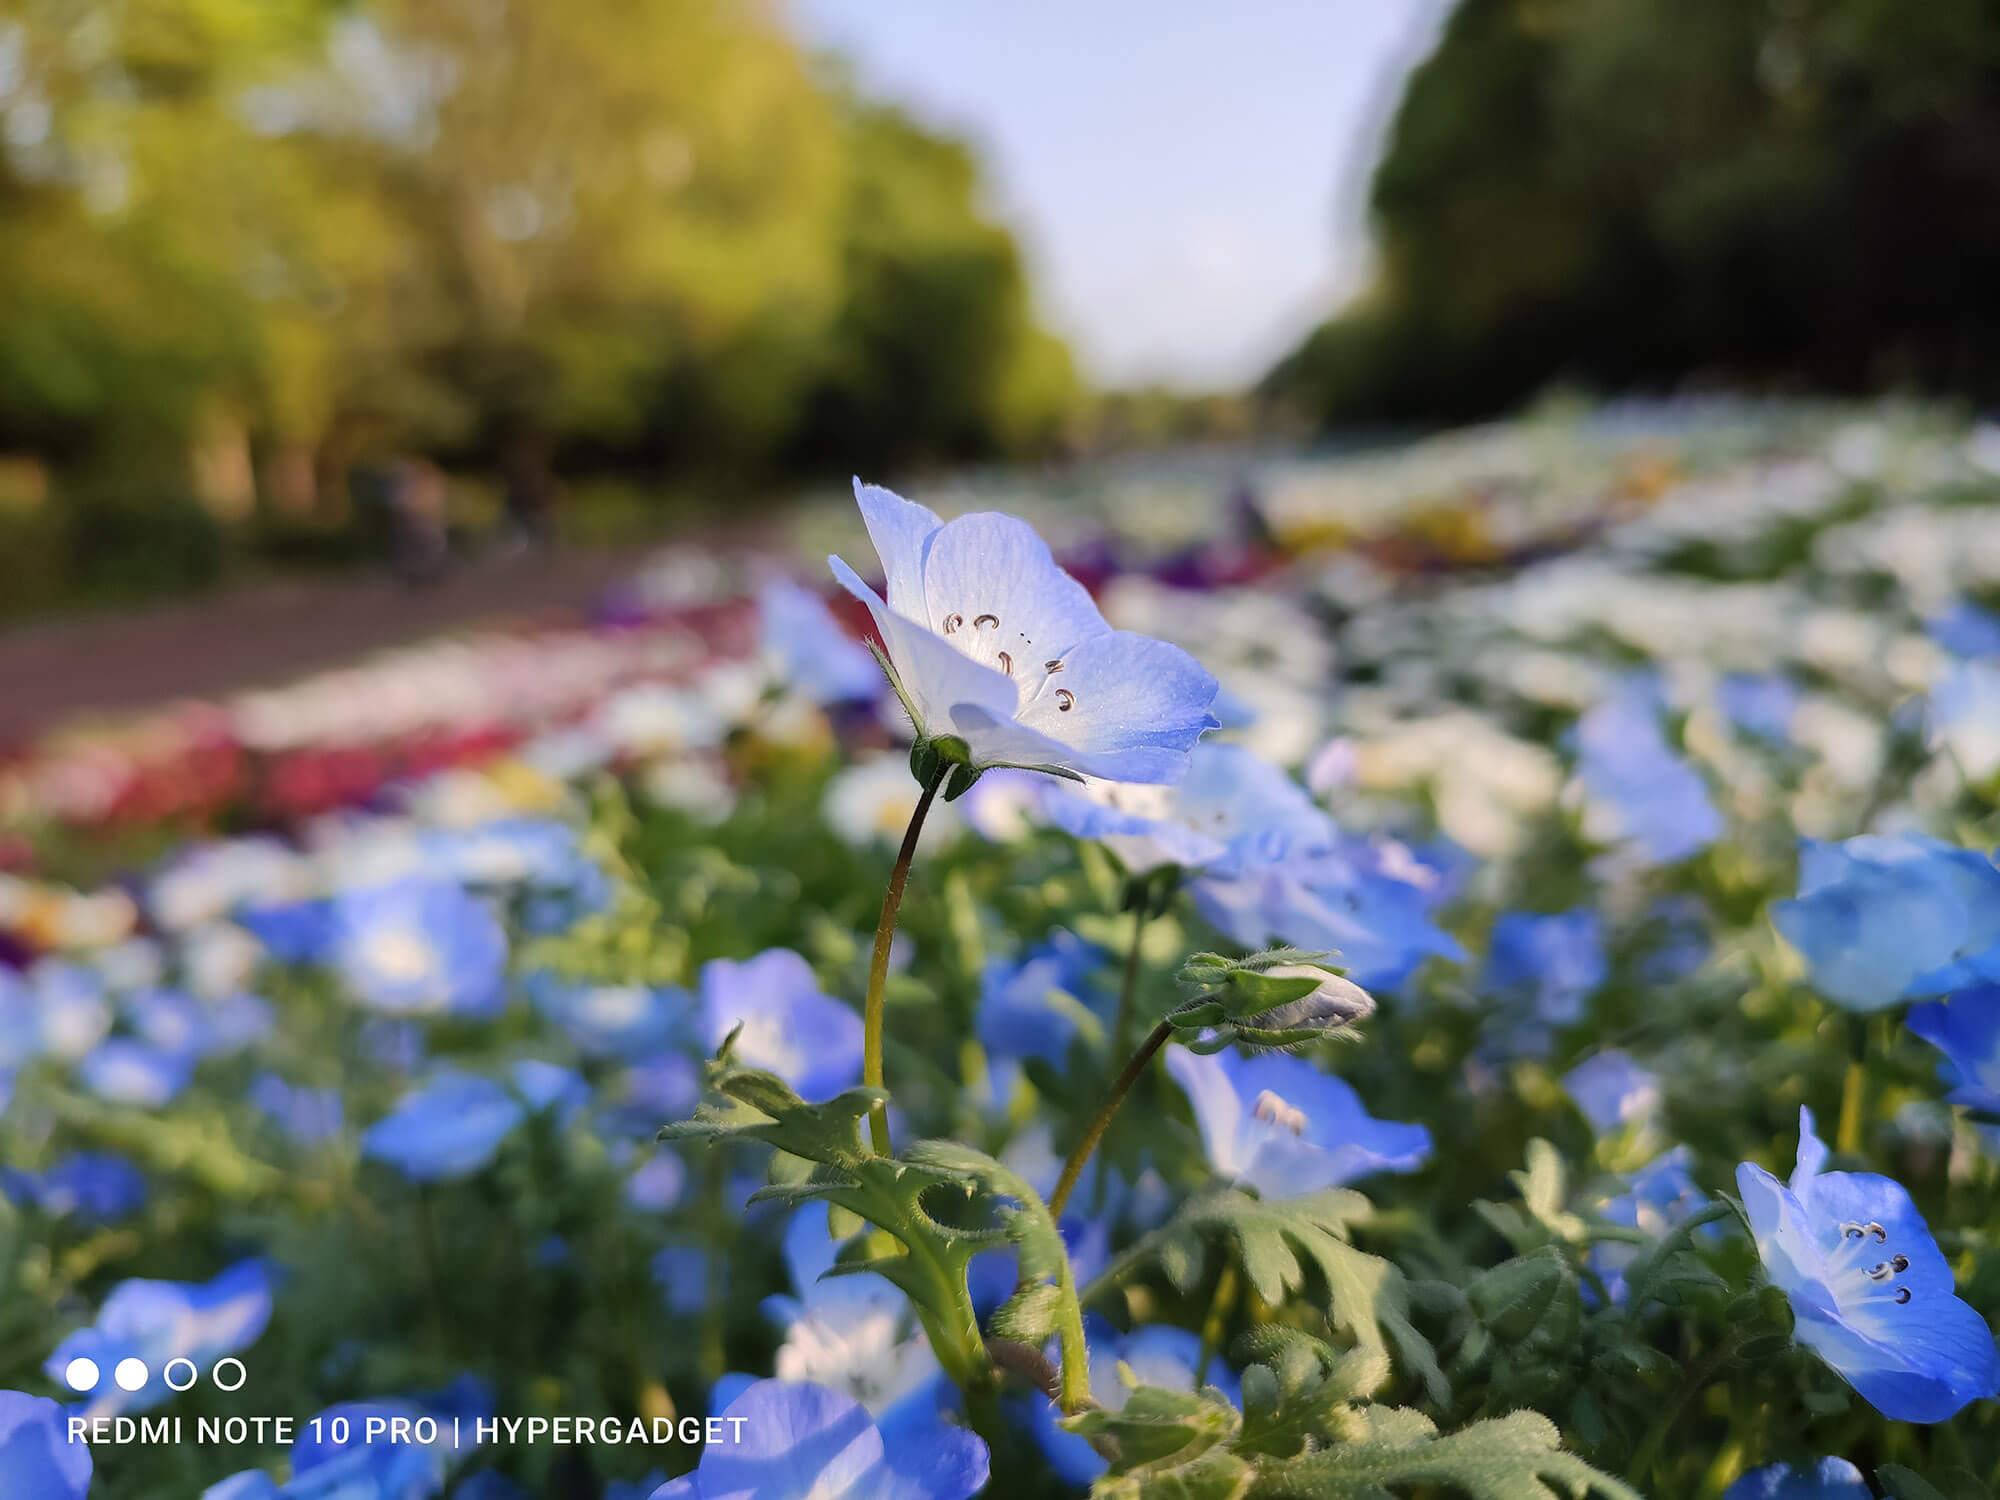 Redmi Note 10 Proのメインカメラで撮影した青い花の画像